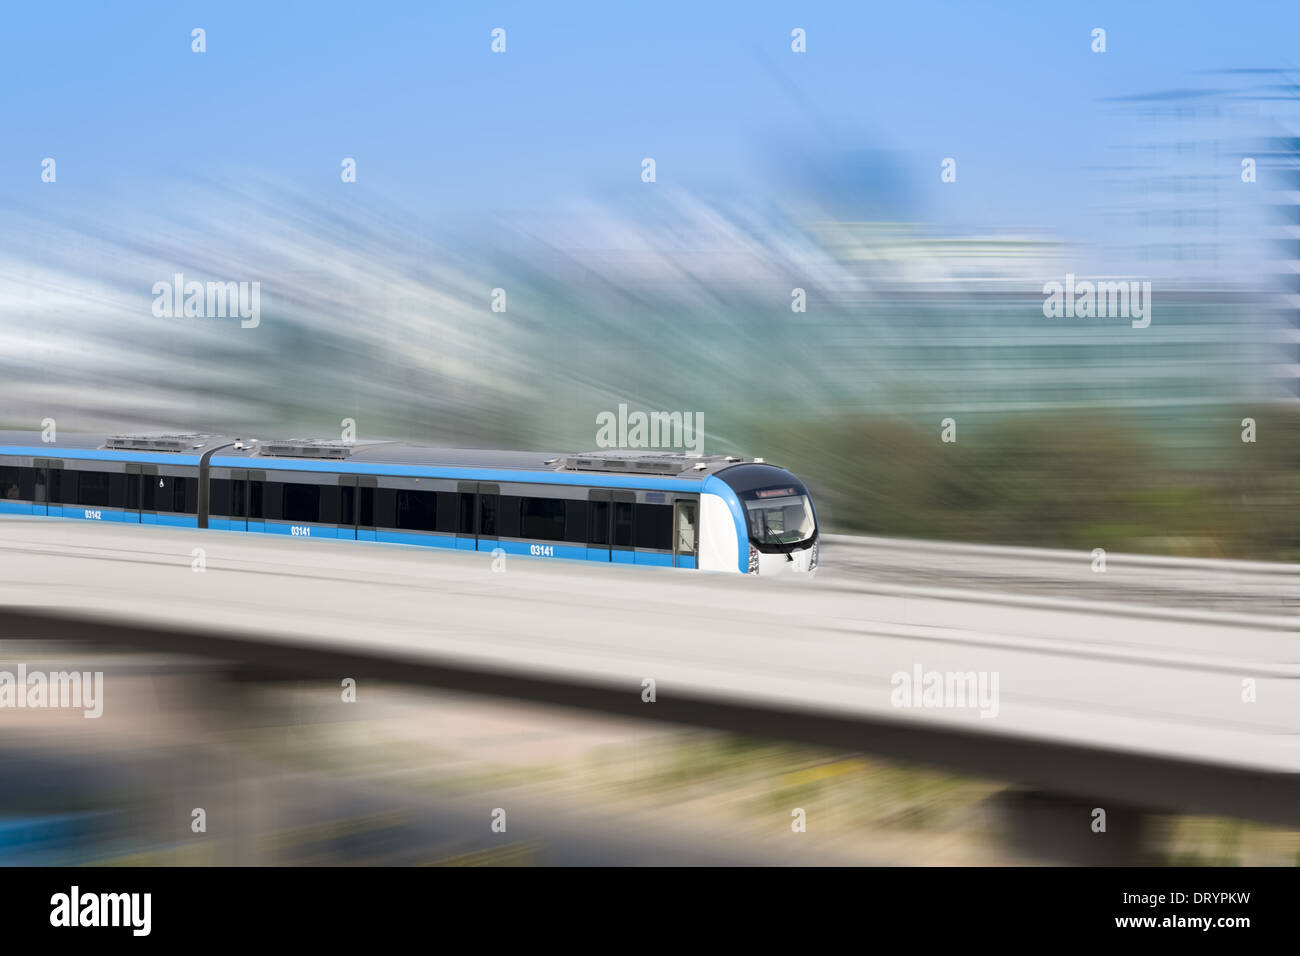 city rails transportation - Stock Image